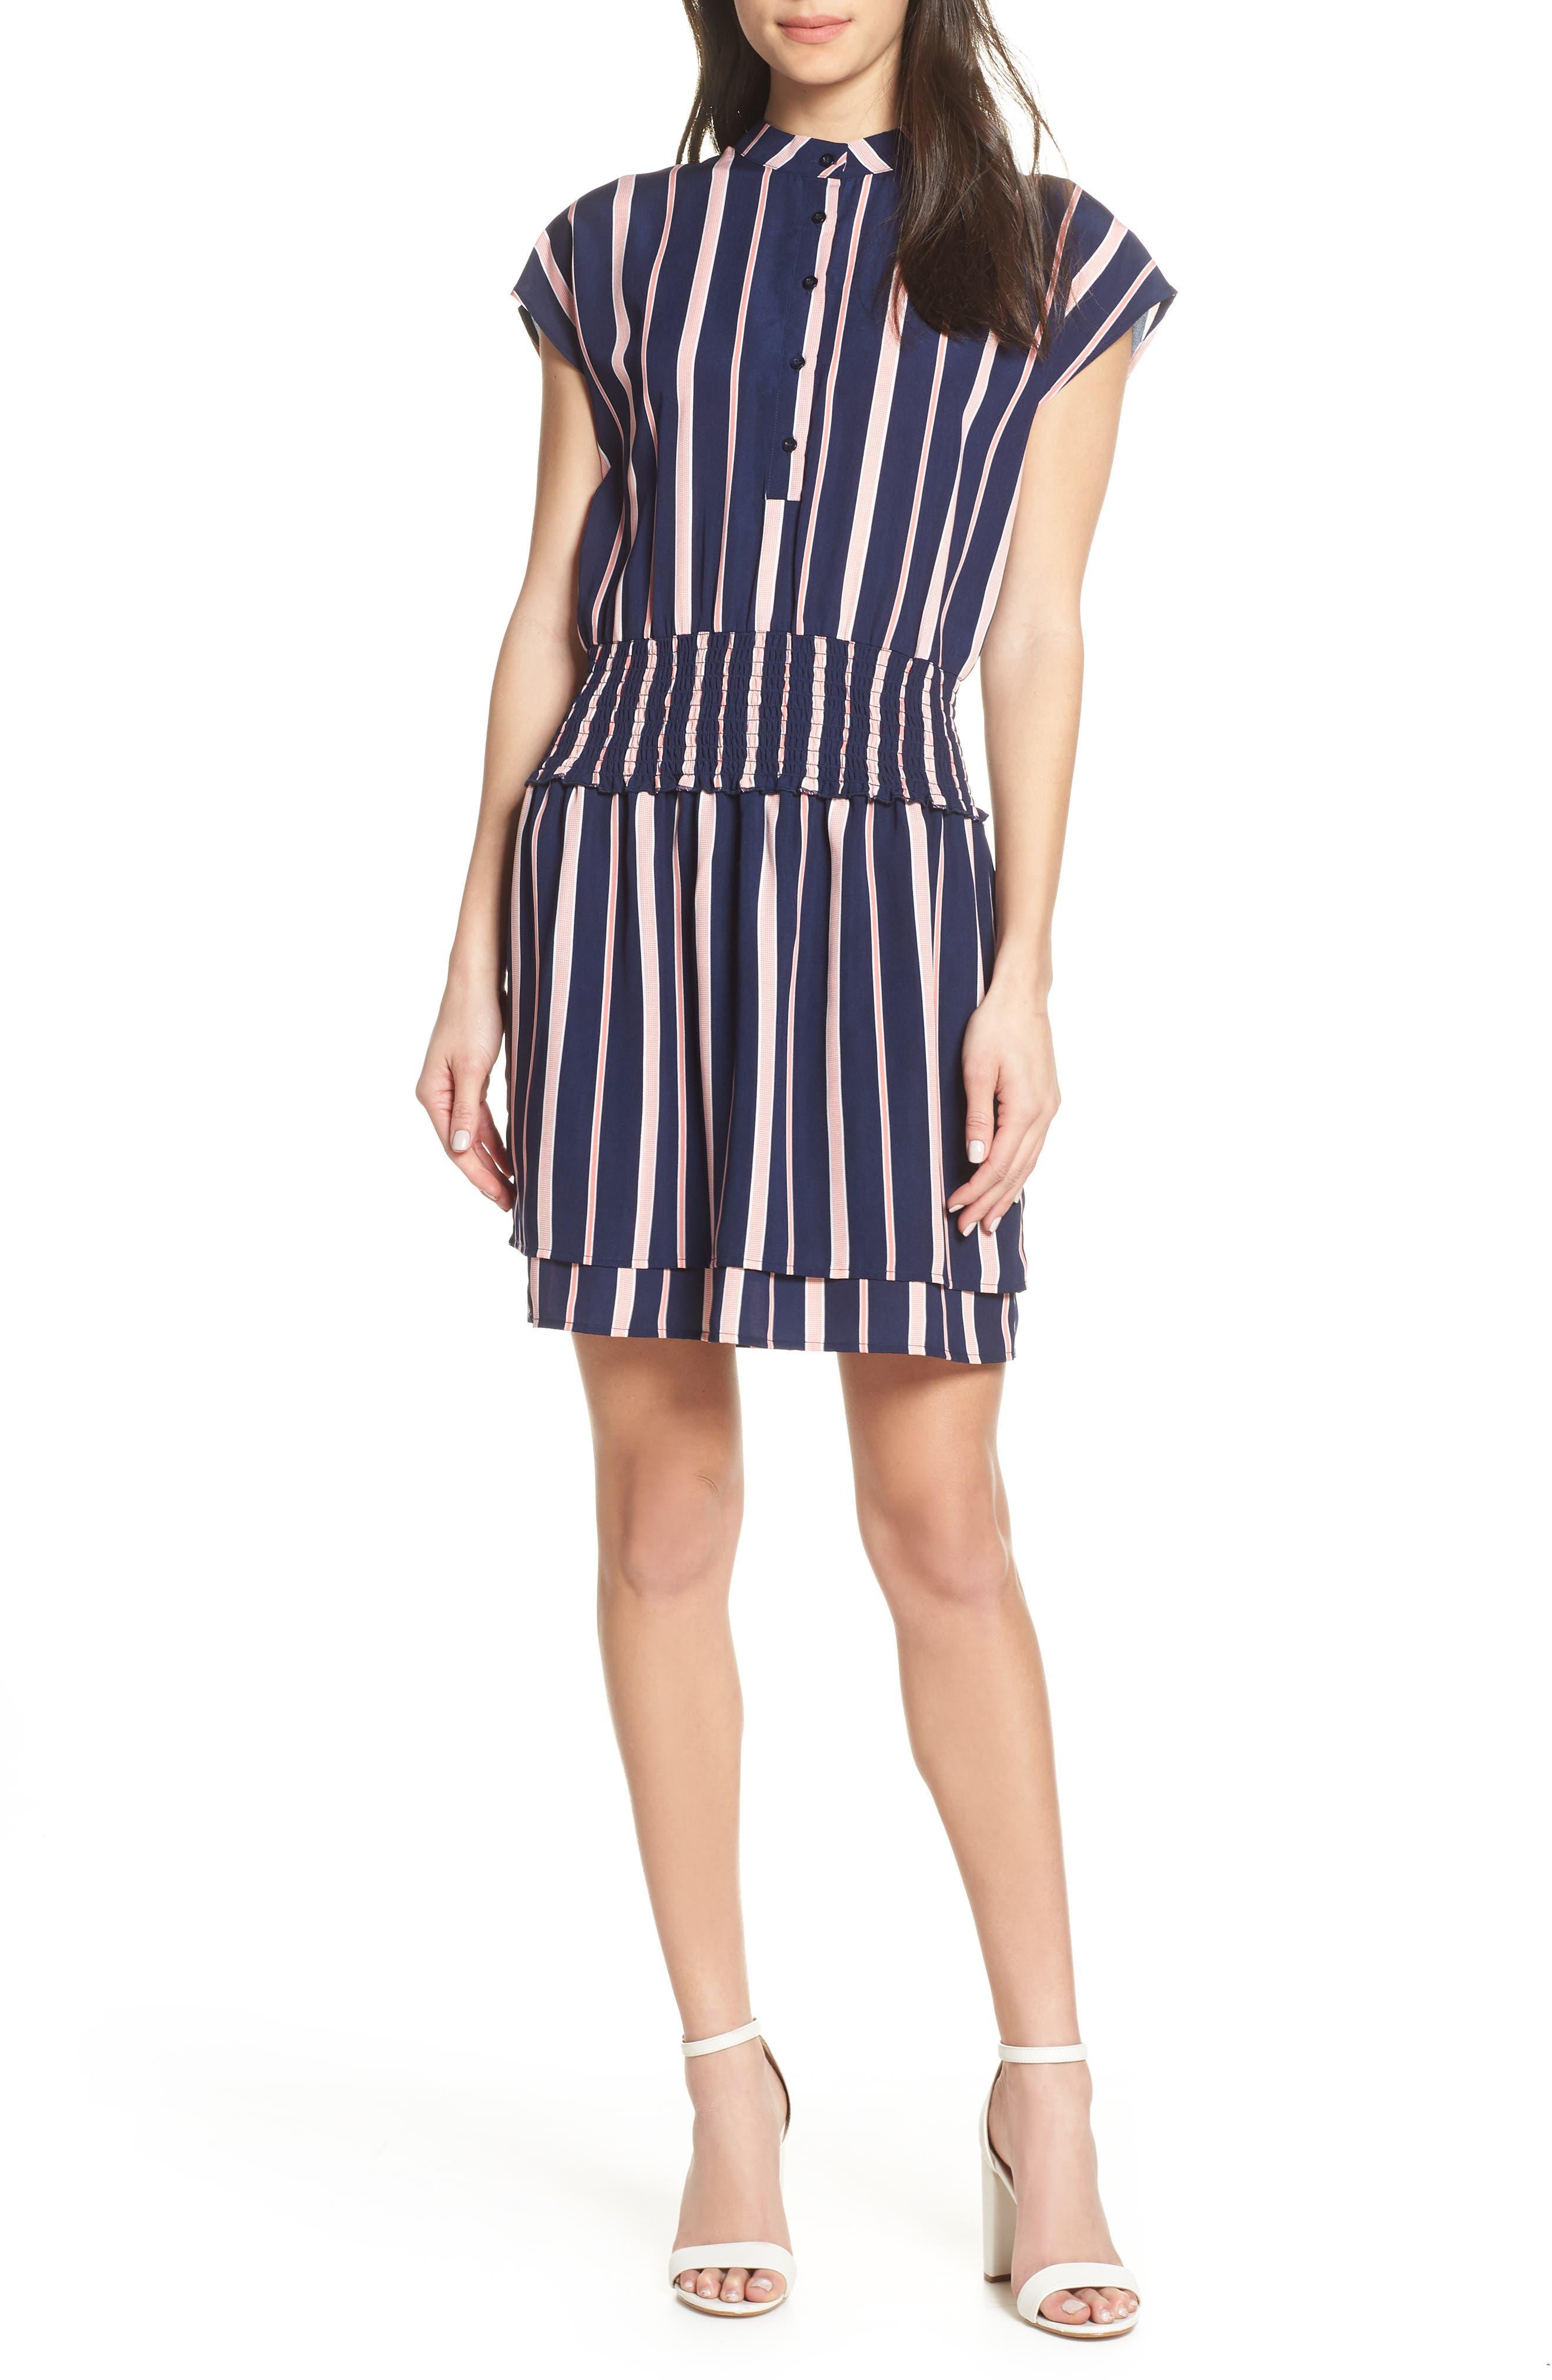 CHARLES HENRY Smocked Stripe Dress, Main, color, NAVY/ PINK STRIPE